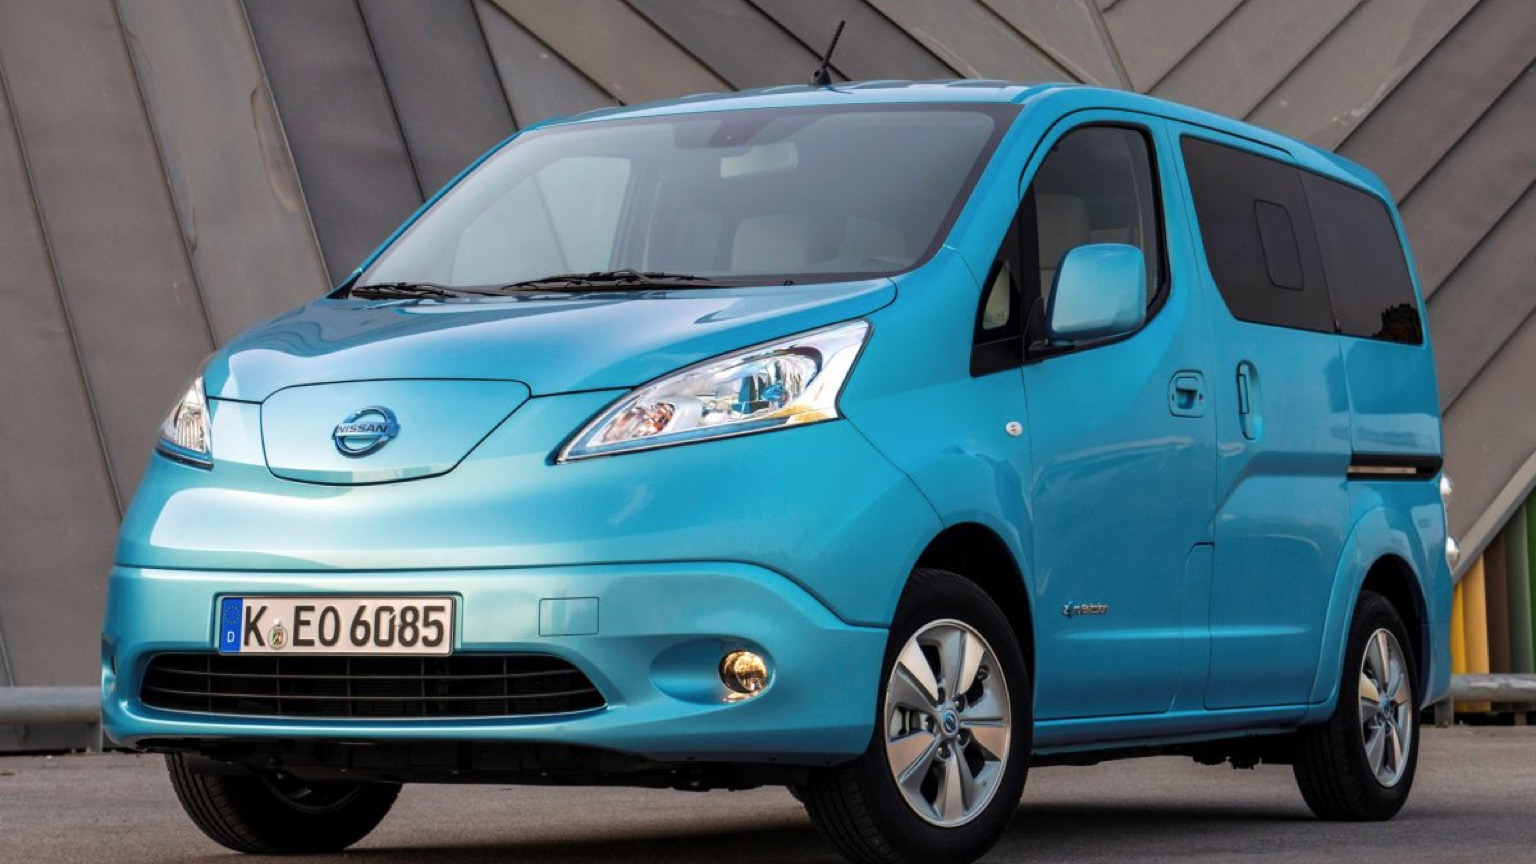 Nissan e-NV200 Evalia 22 kWh